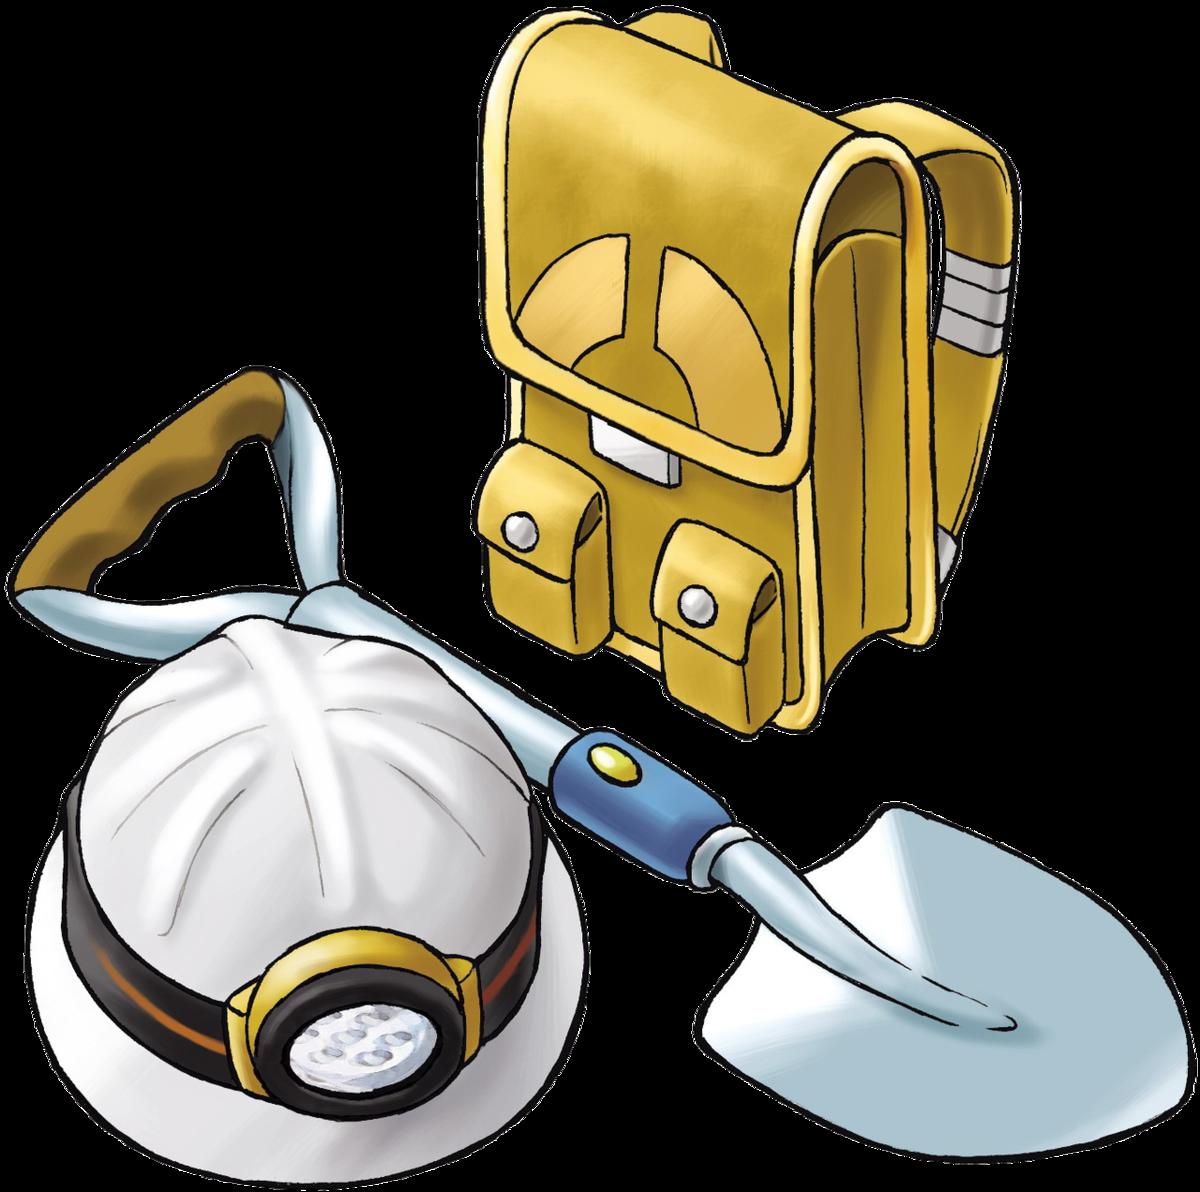 Clipart hammer mining. Explorer kit bulbapedia the